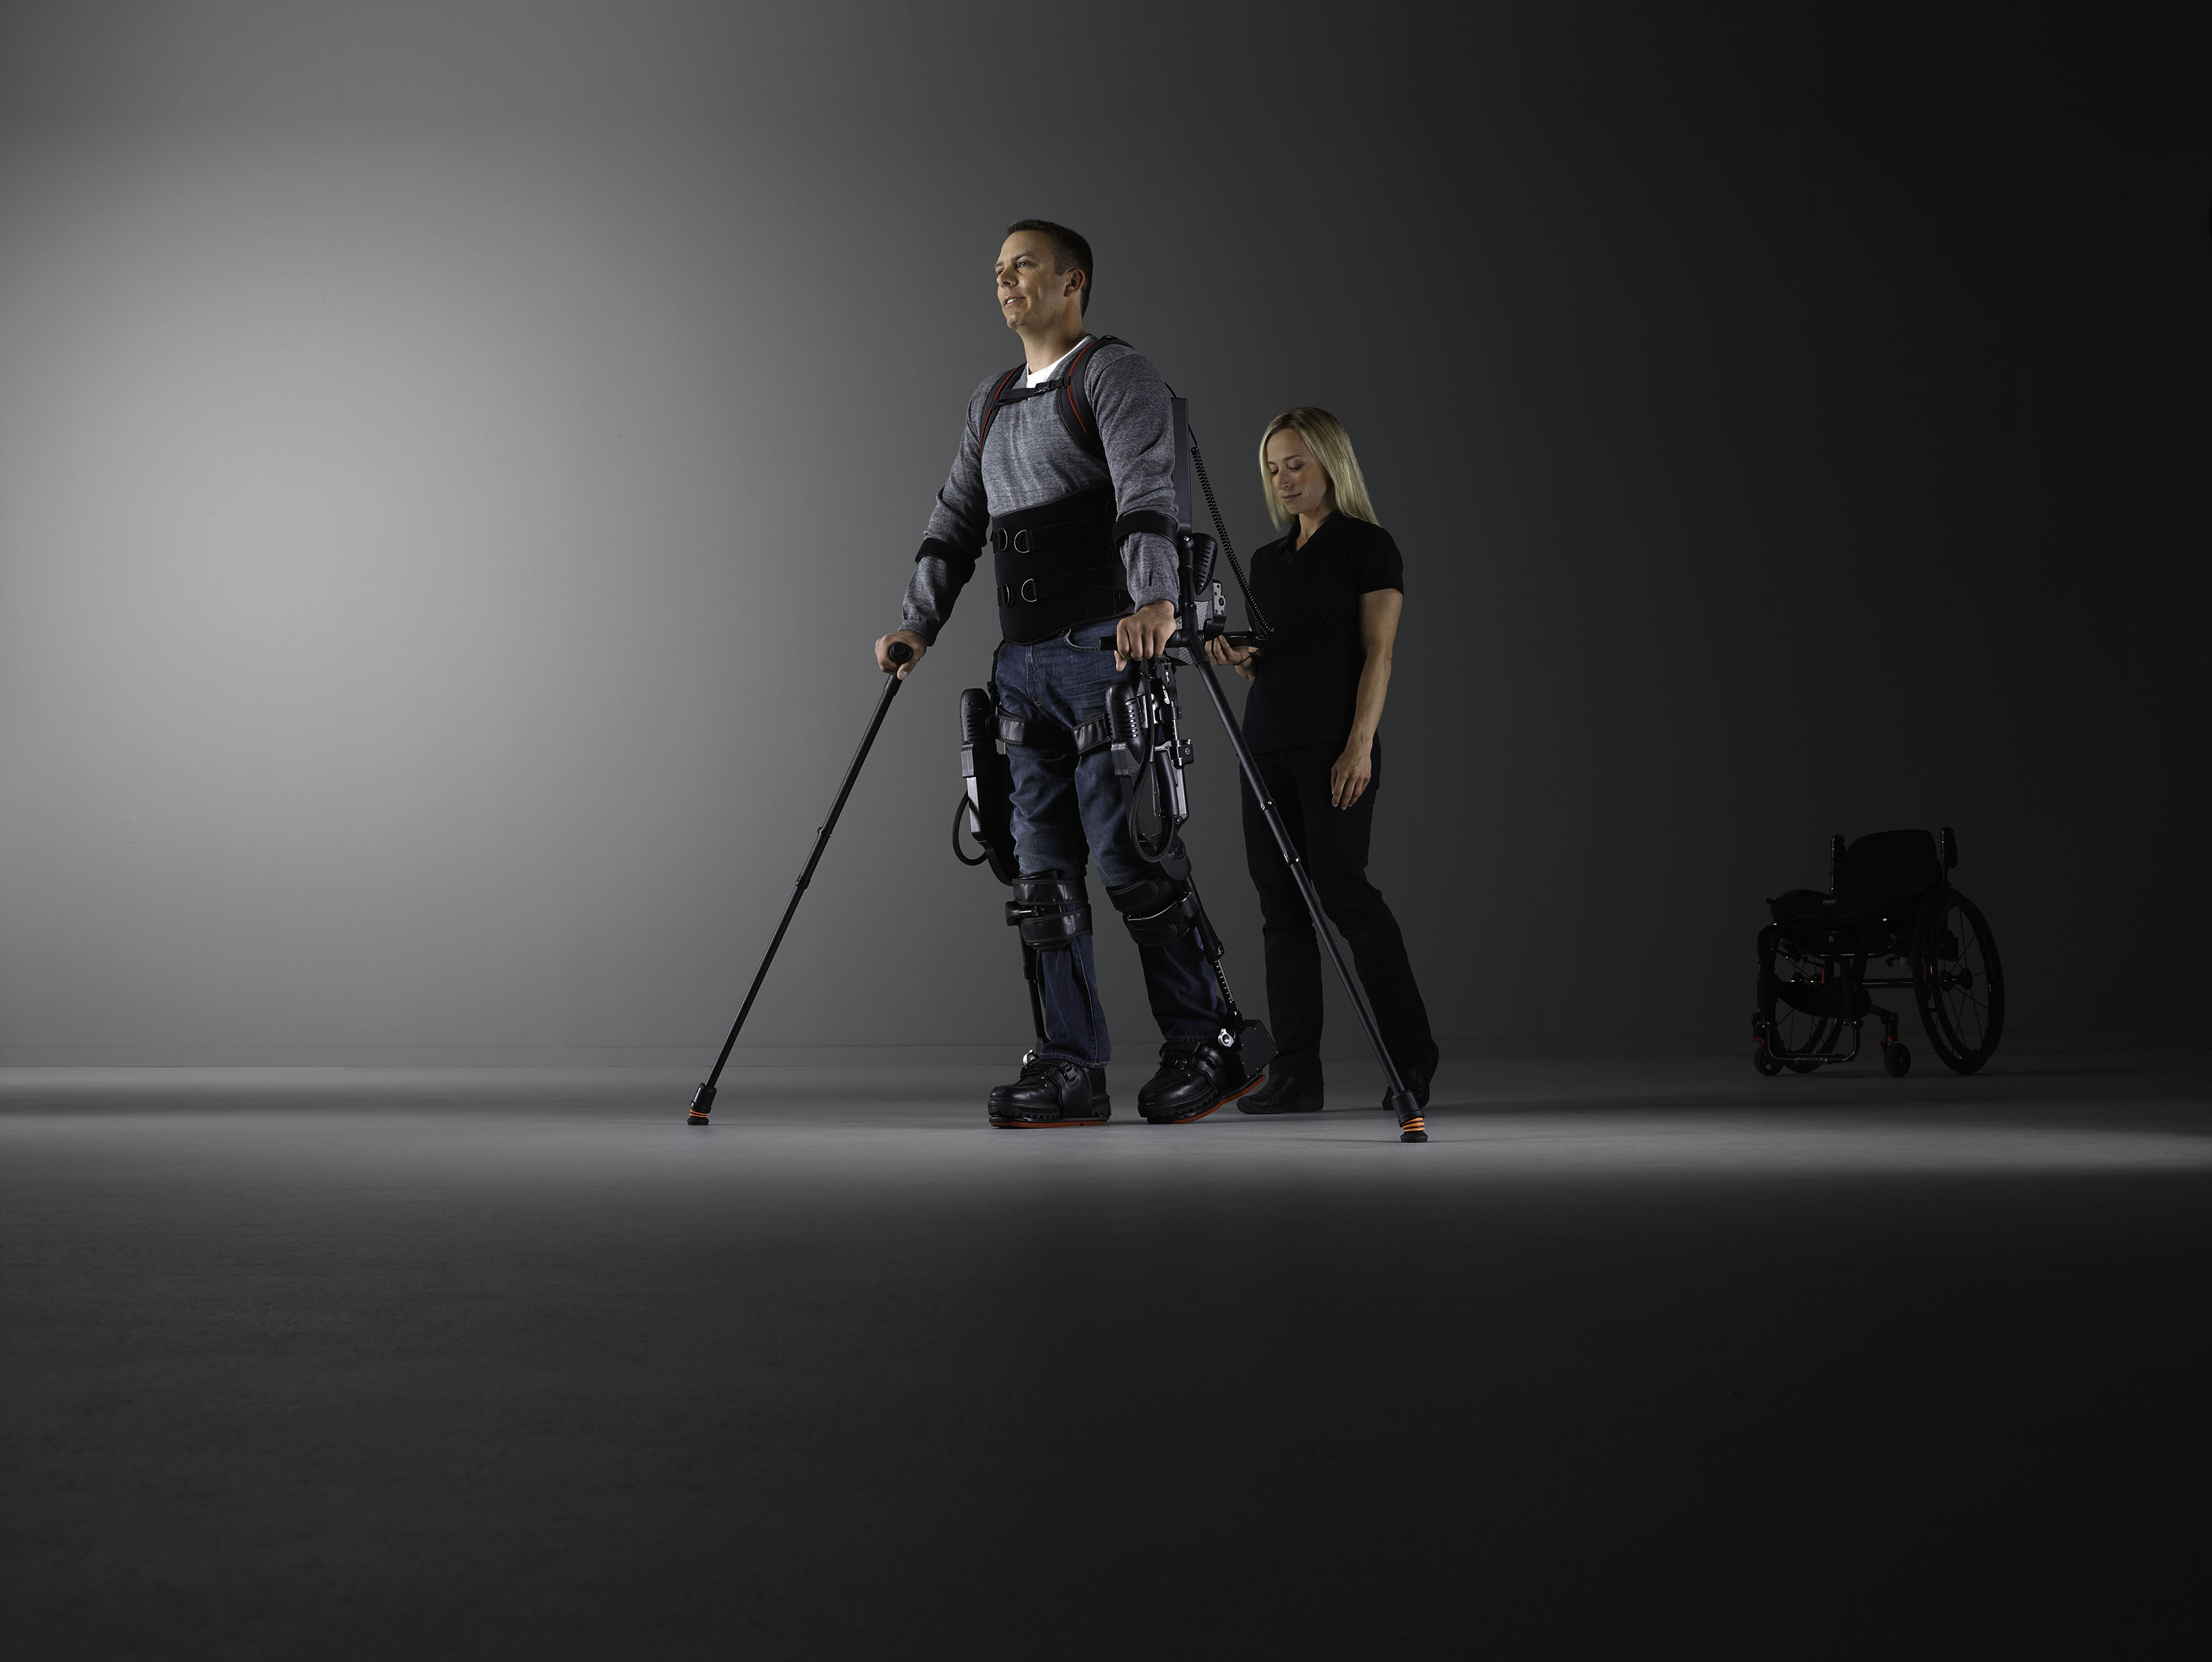 Gehroboter im Fokus der Forschung: Ekso Bionics ruft europaweite Studie ins Leben